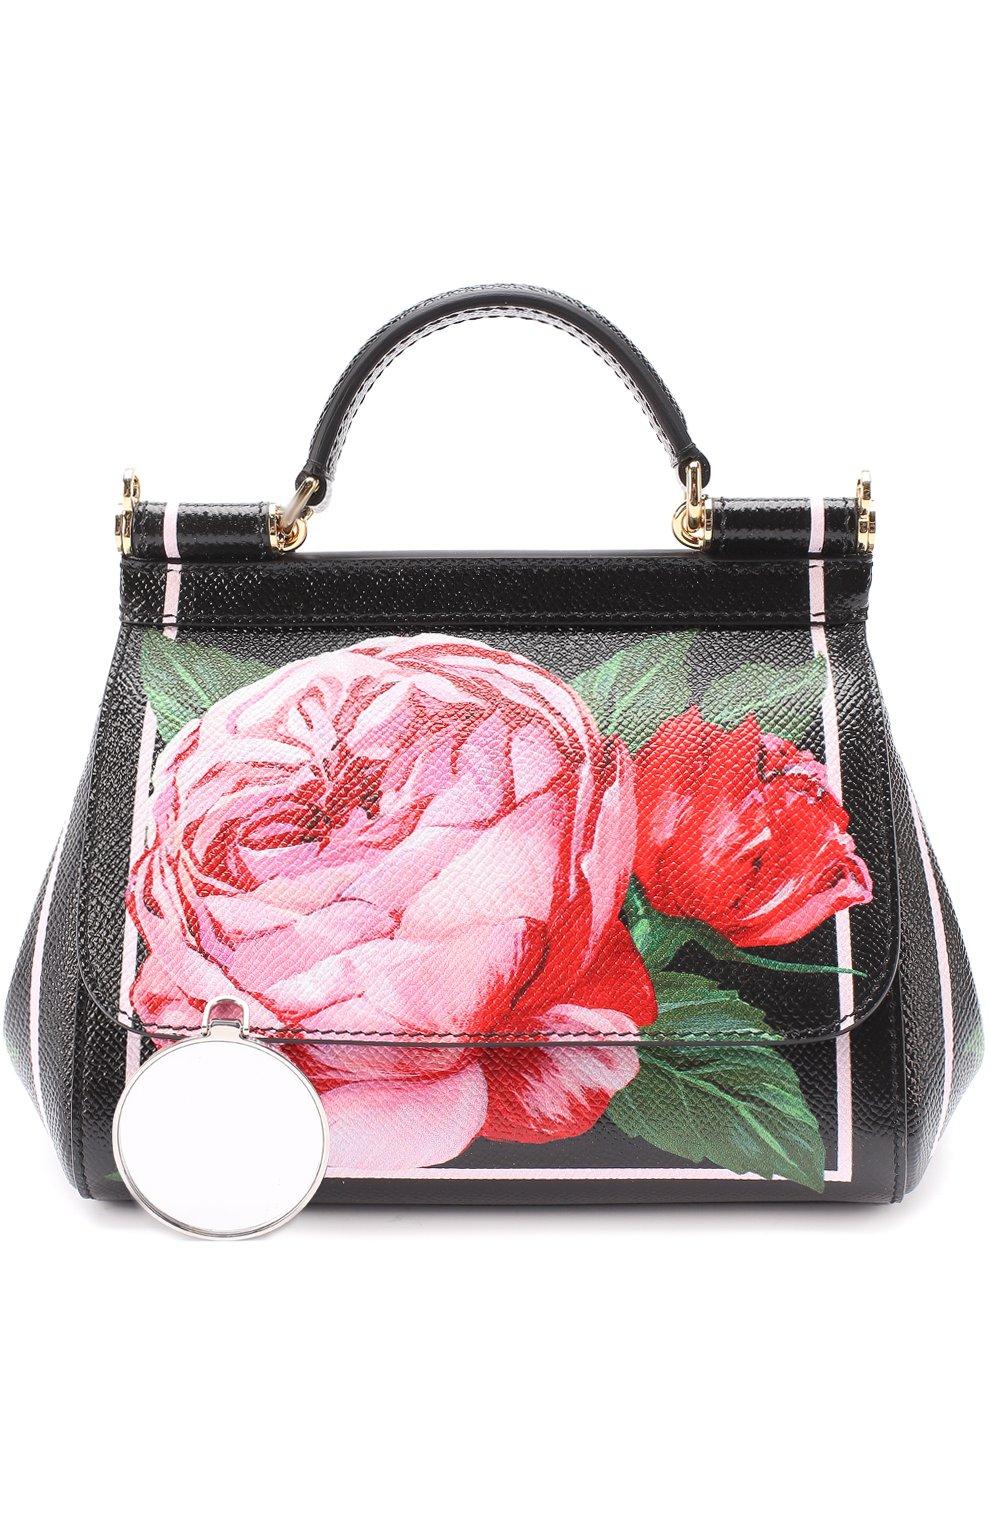 Сумка Sicily micro с принтом Dolce & Gabbana розовая цвета | Фото №5